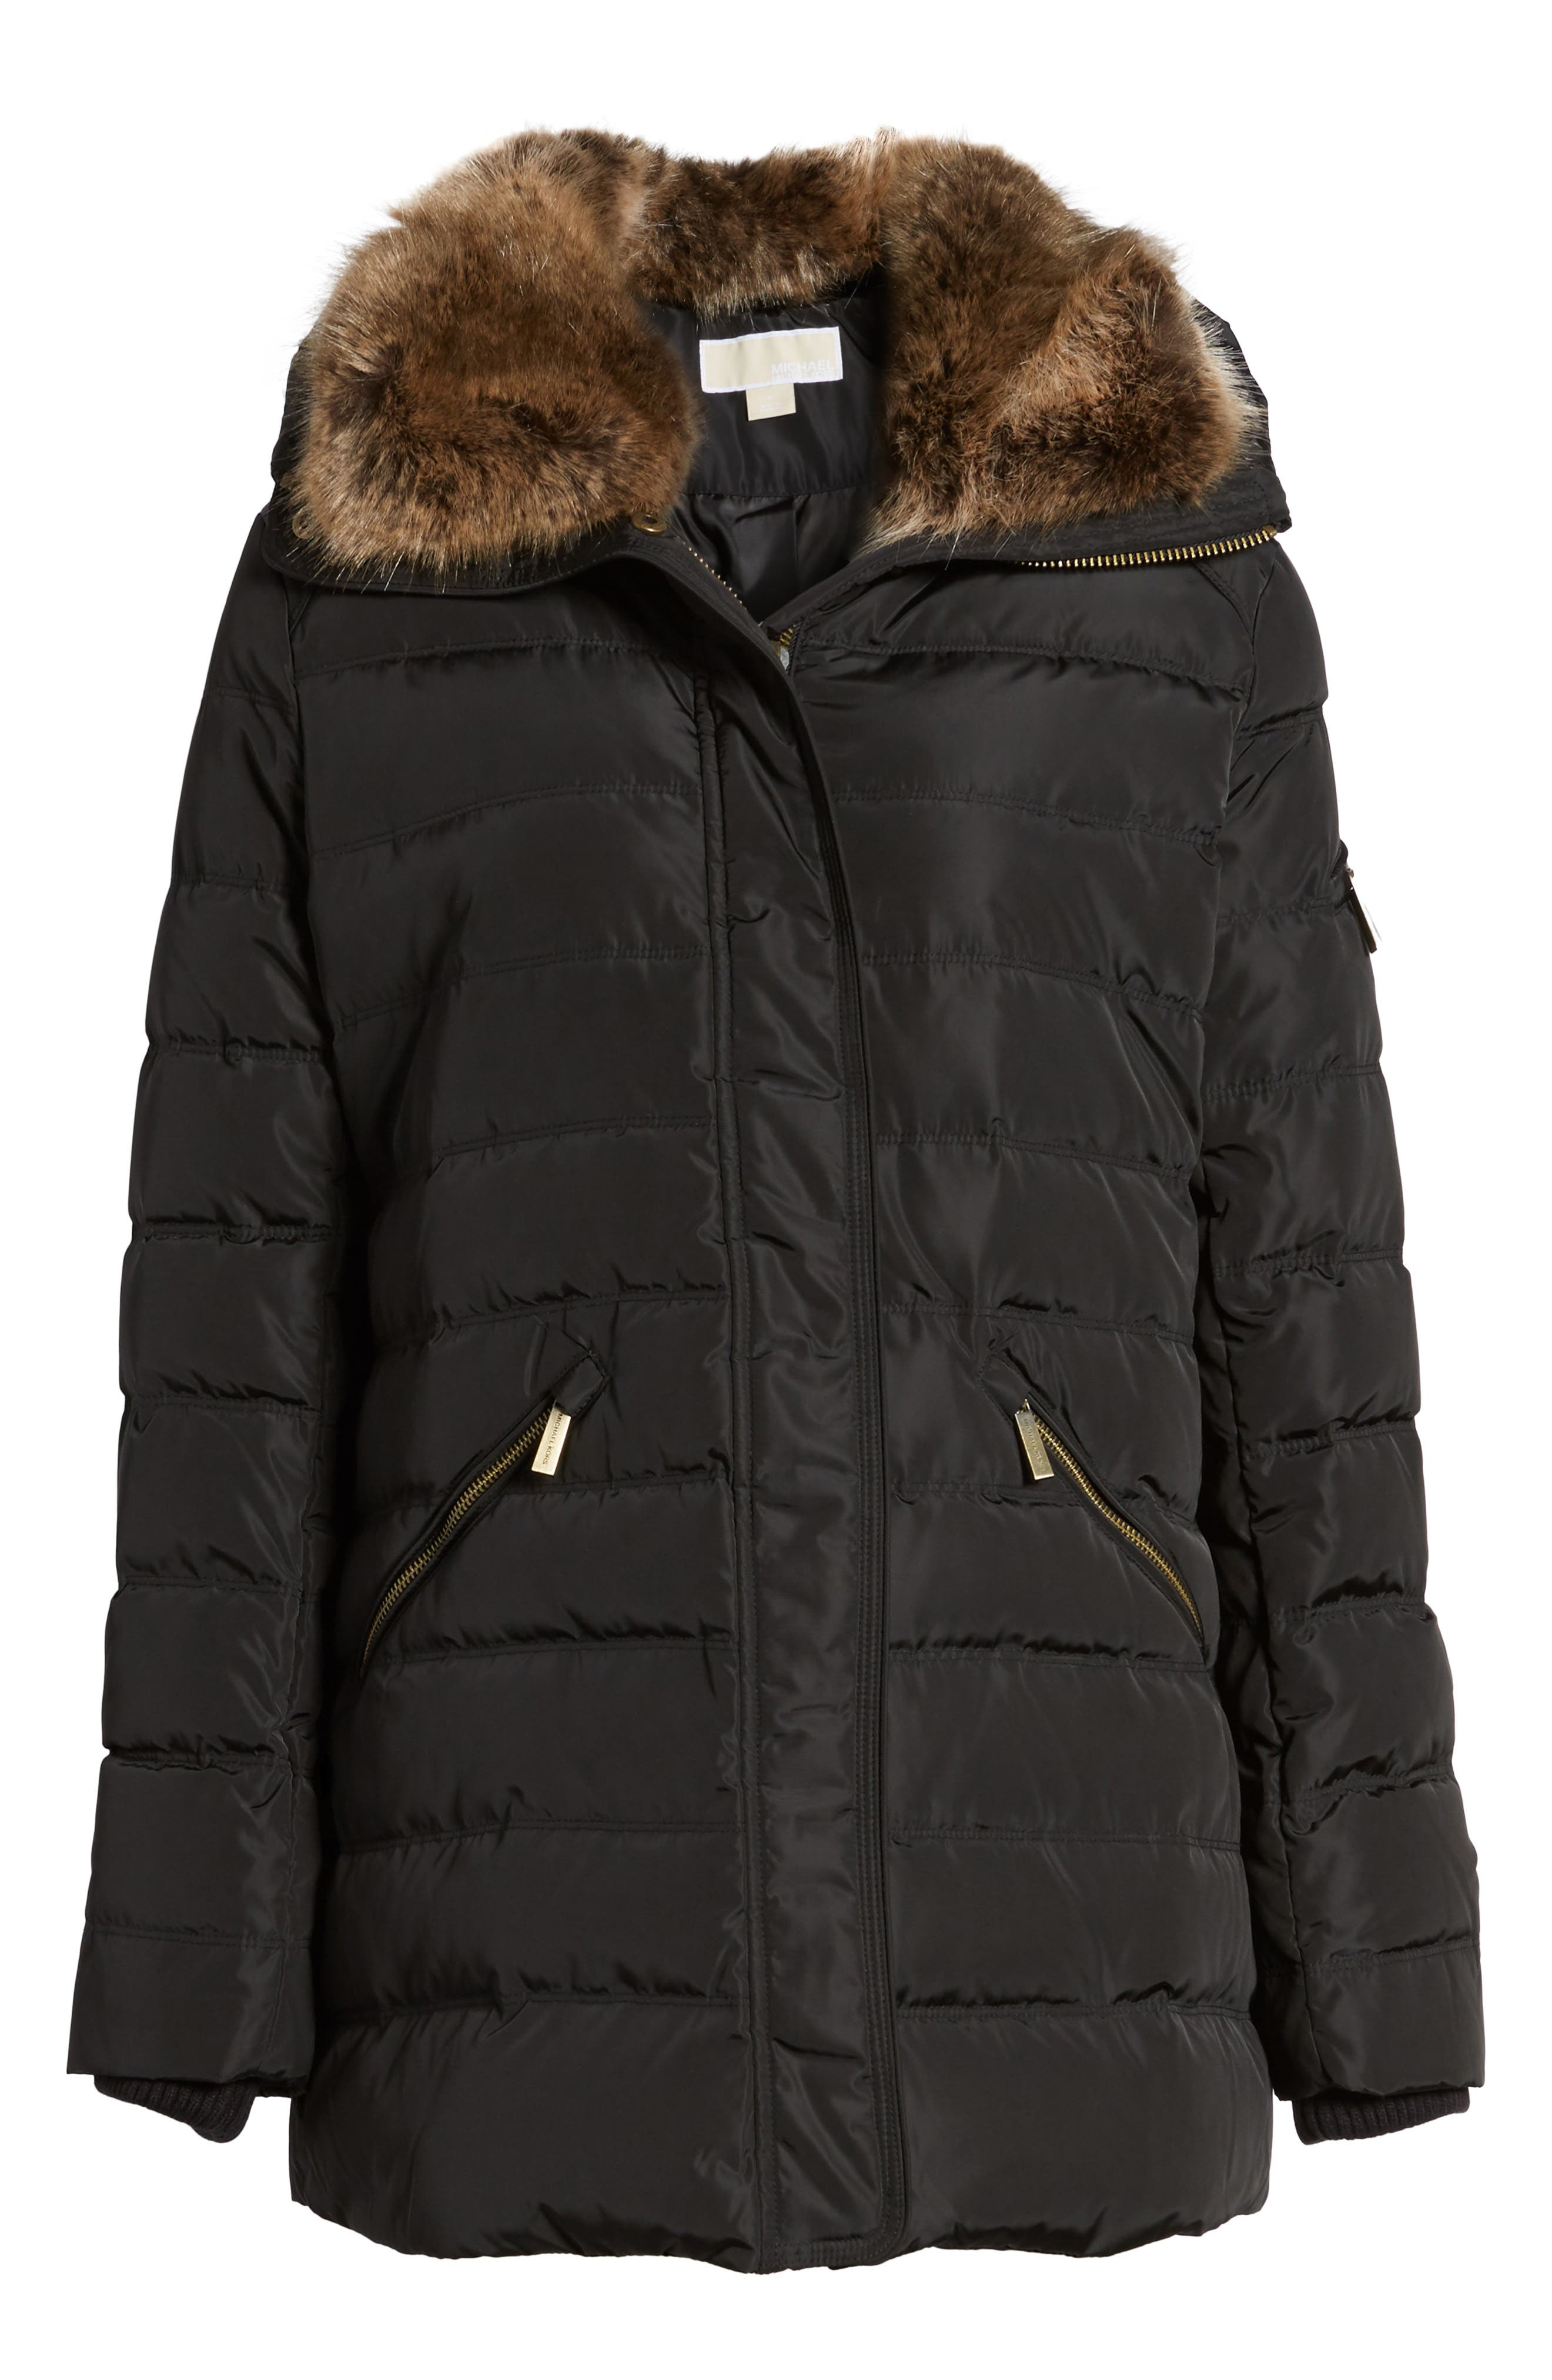 Hooded Coat with Faux Fur Trim,                             Main thumbnail 1, color,                             Black